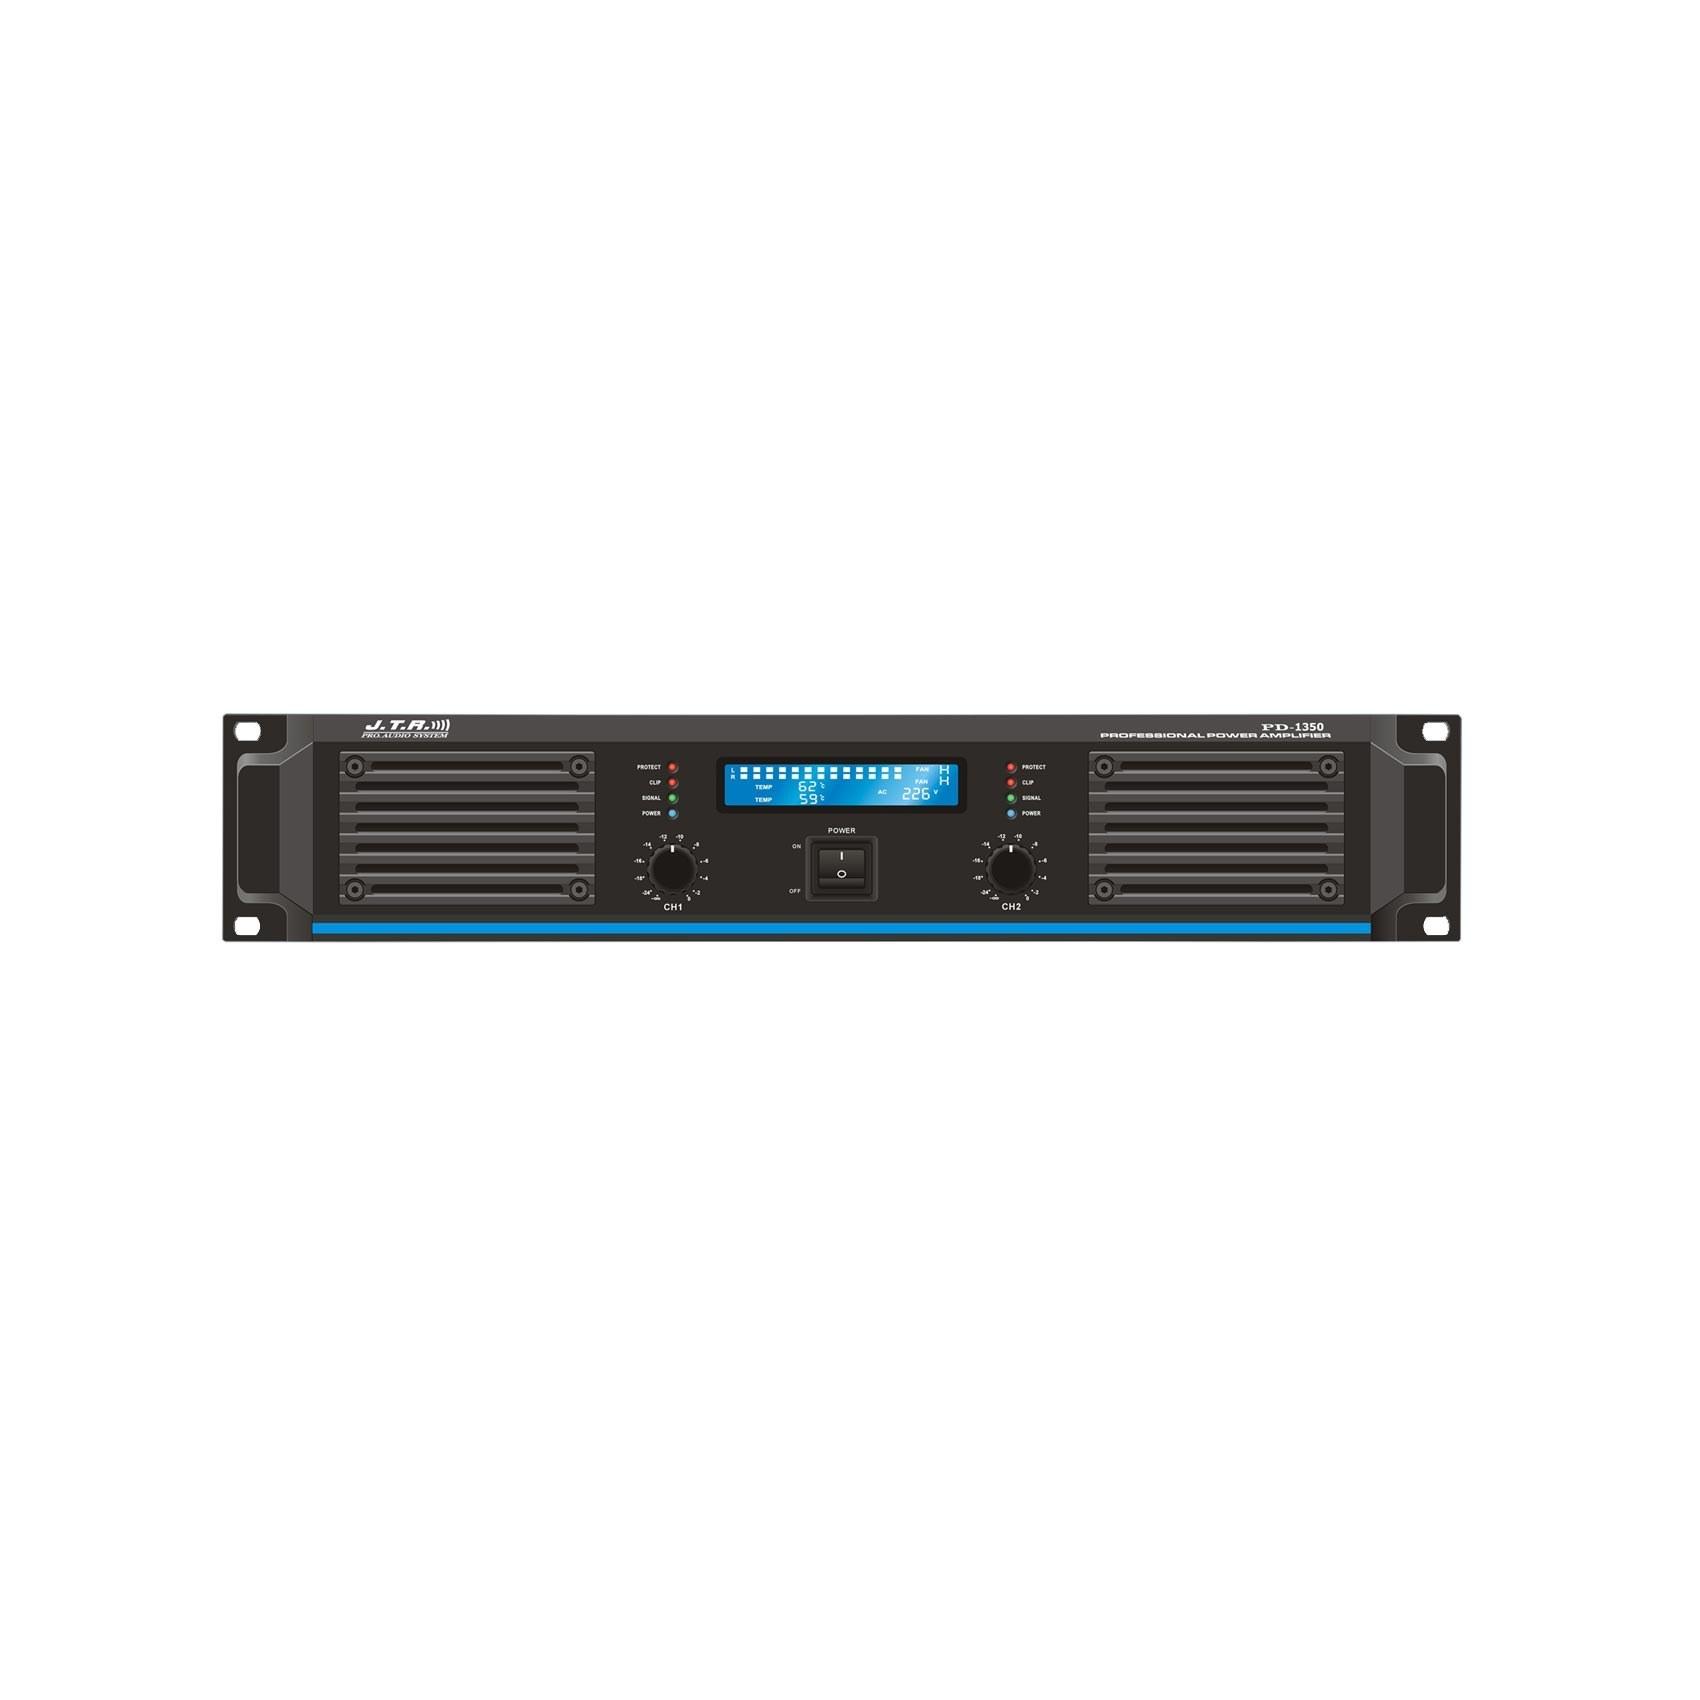 عکس پاور آمپلی فایر جی تی ار مدل PD1350 JTR PD1350 Power Amplifier پاور-امپلی-فایر-جی-تی-ار-مدل-pd1350